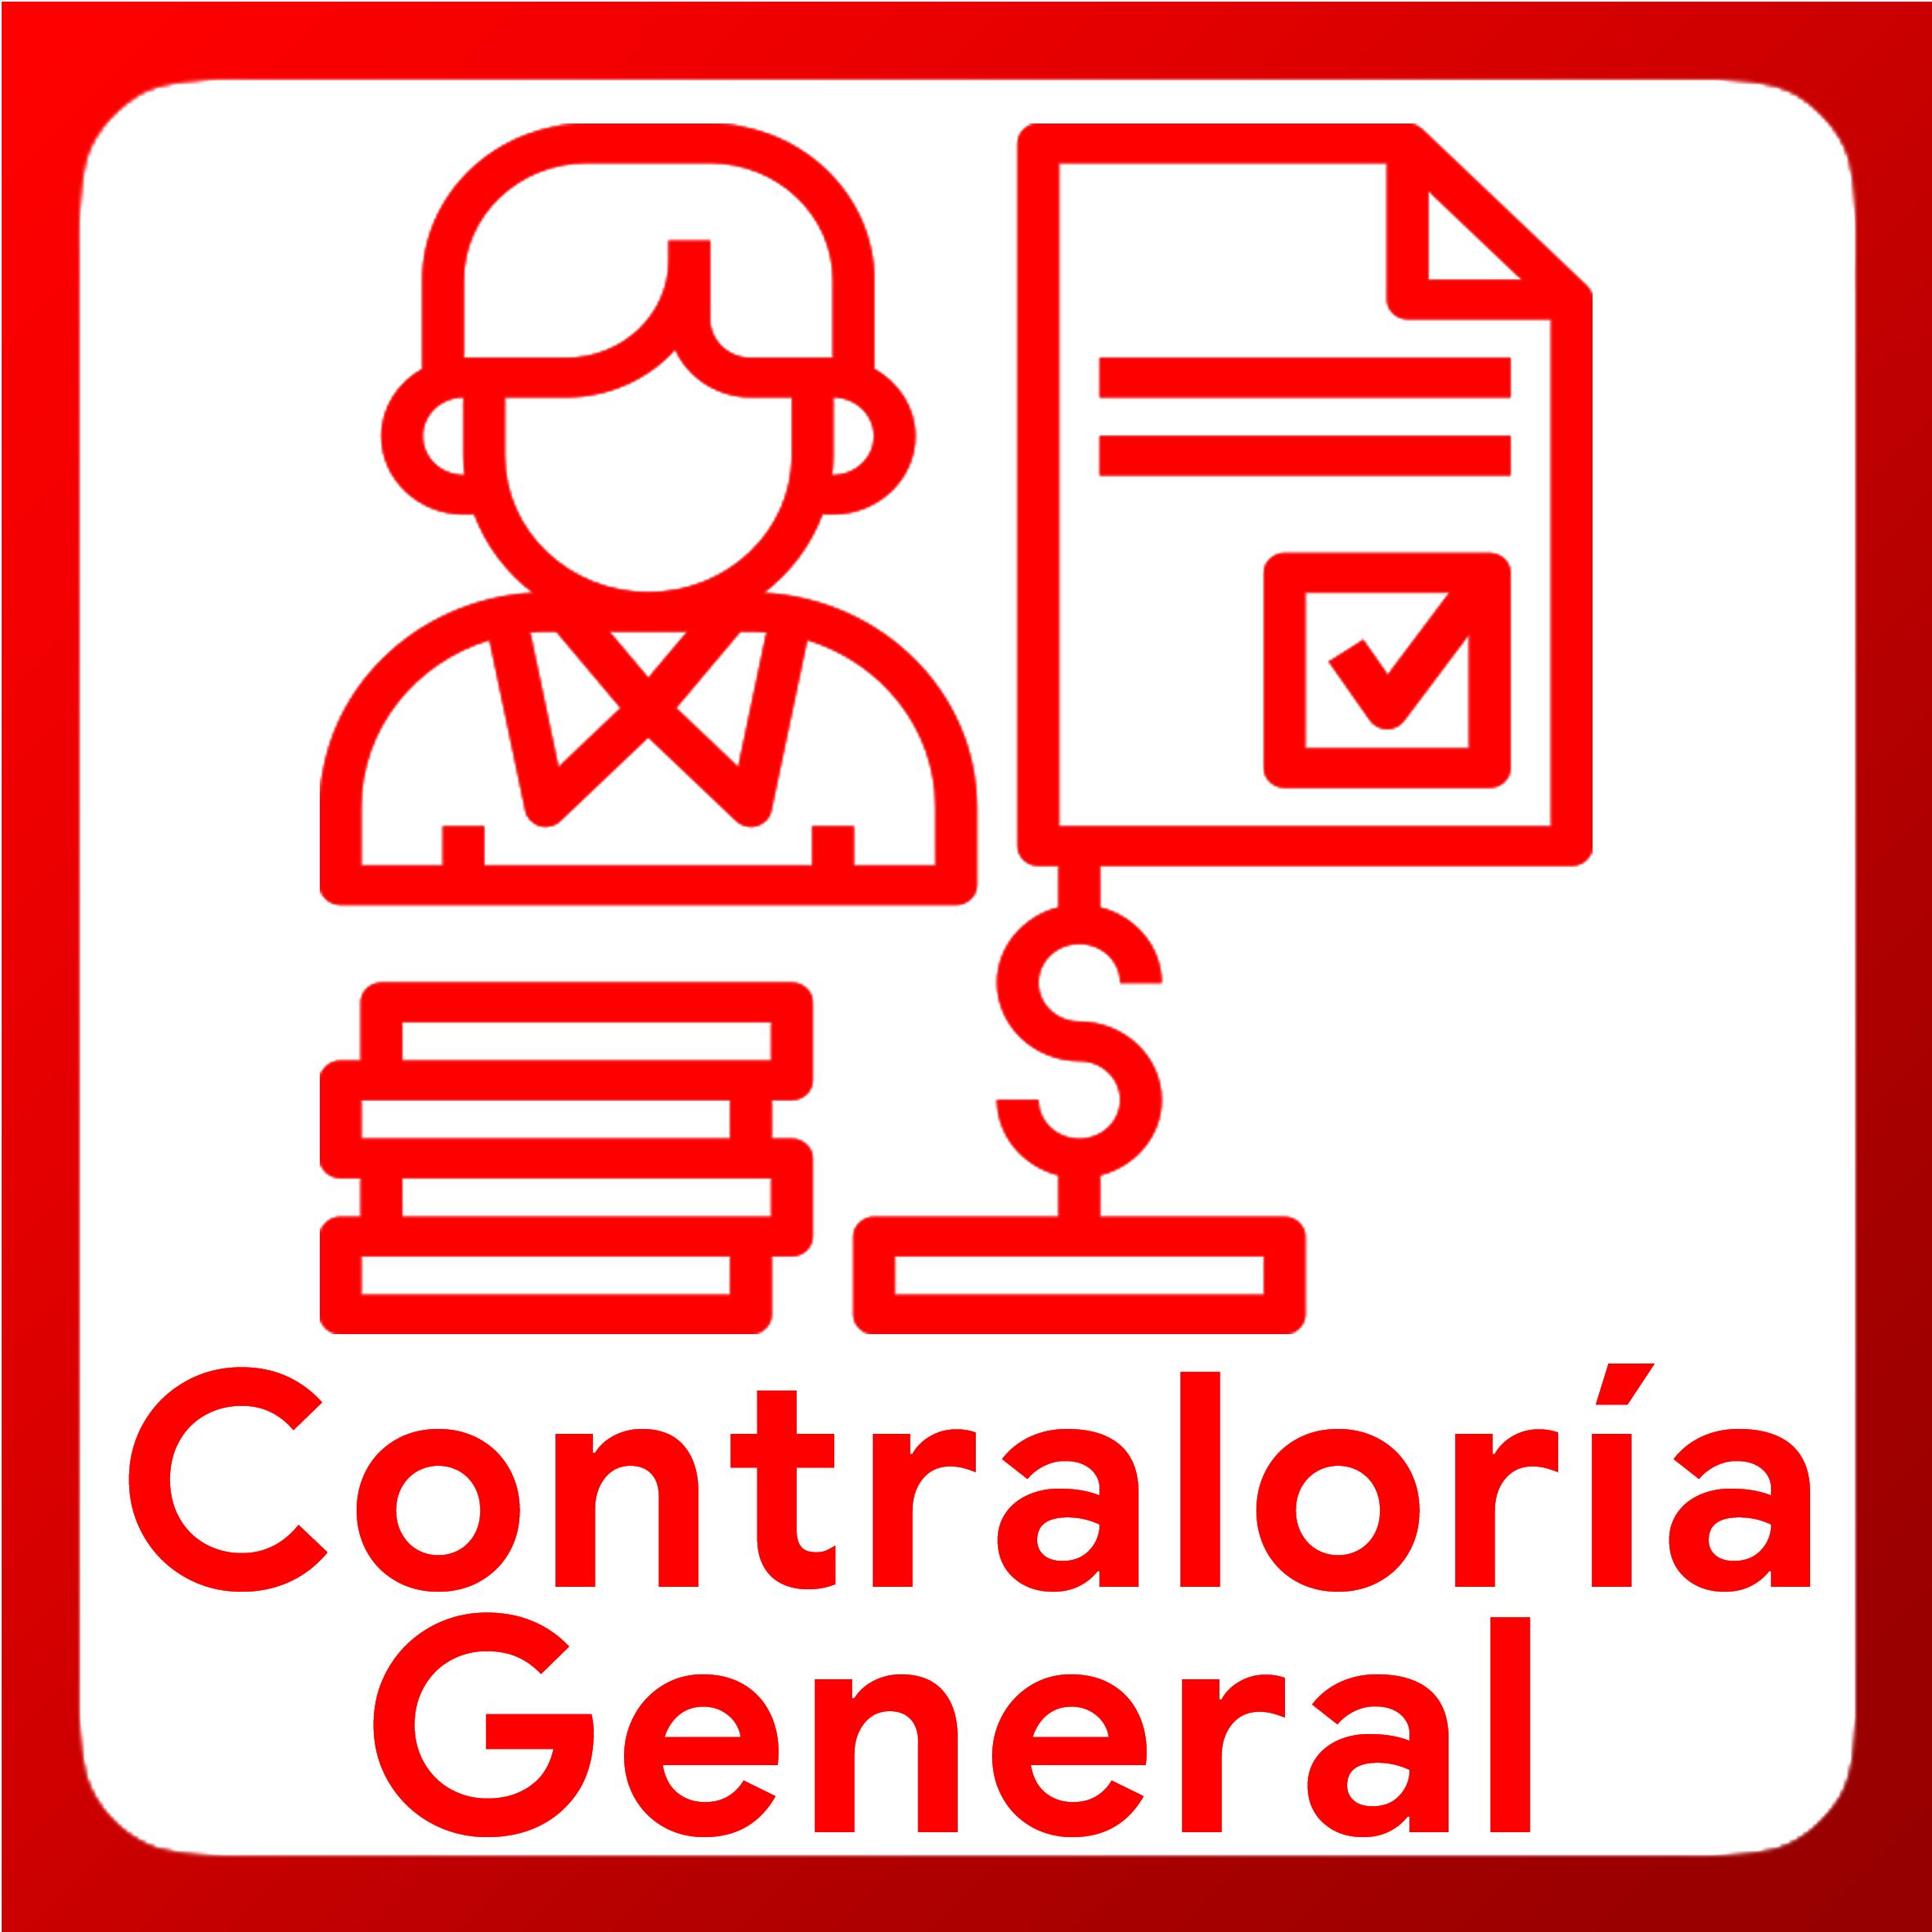 Boton activable de Contraloría General